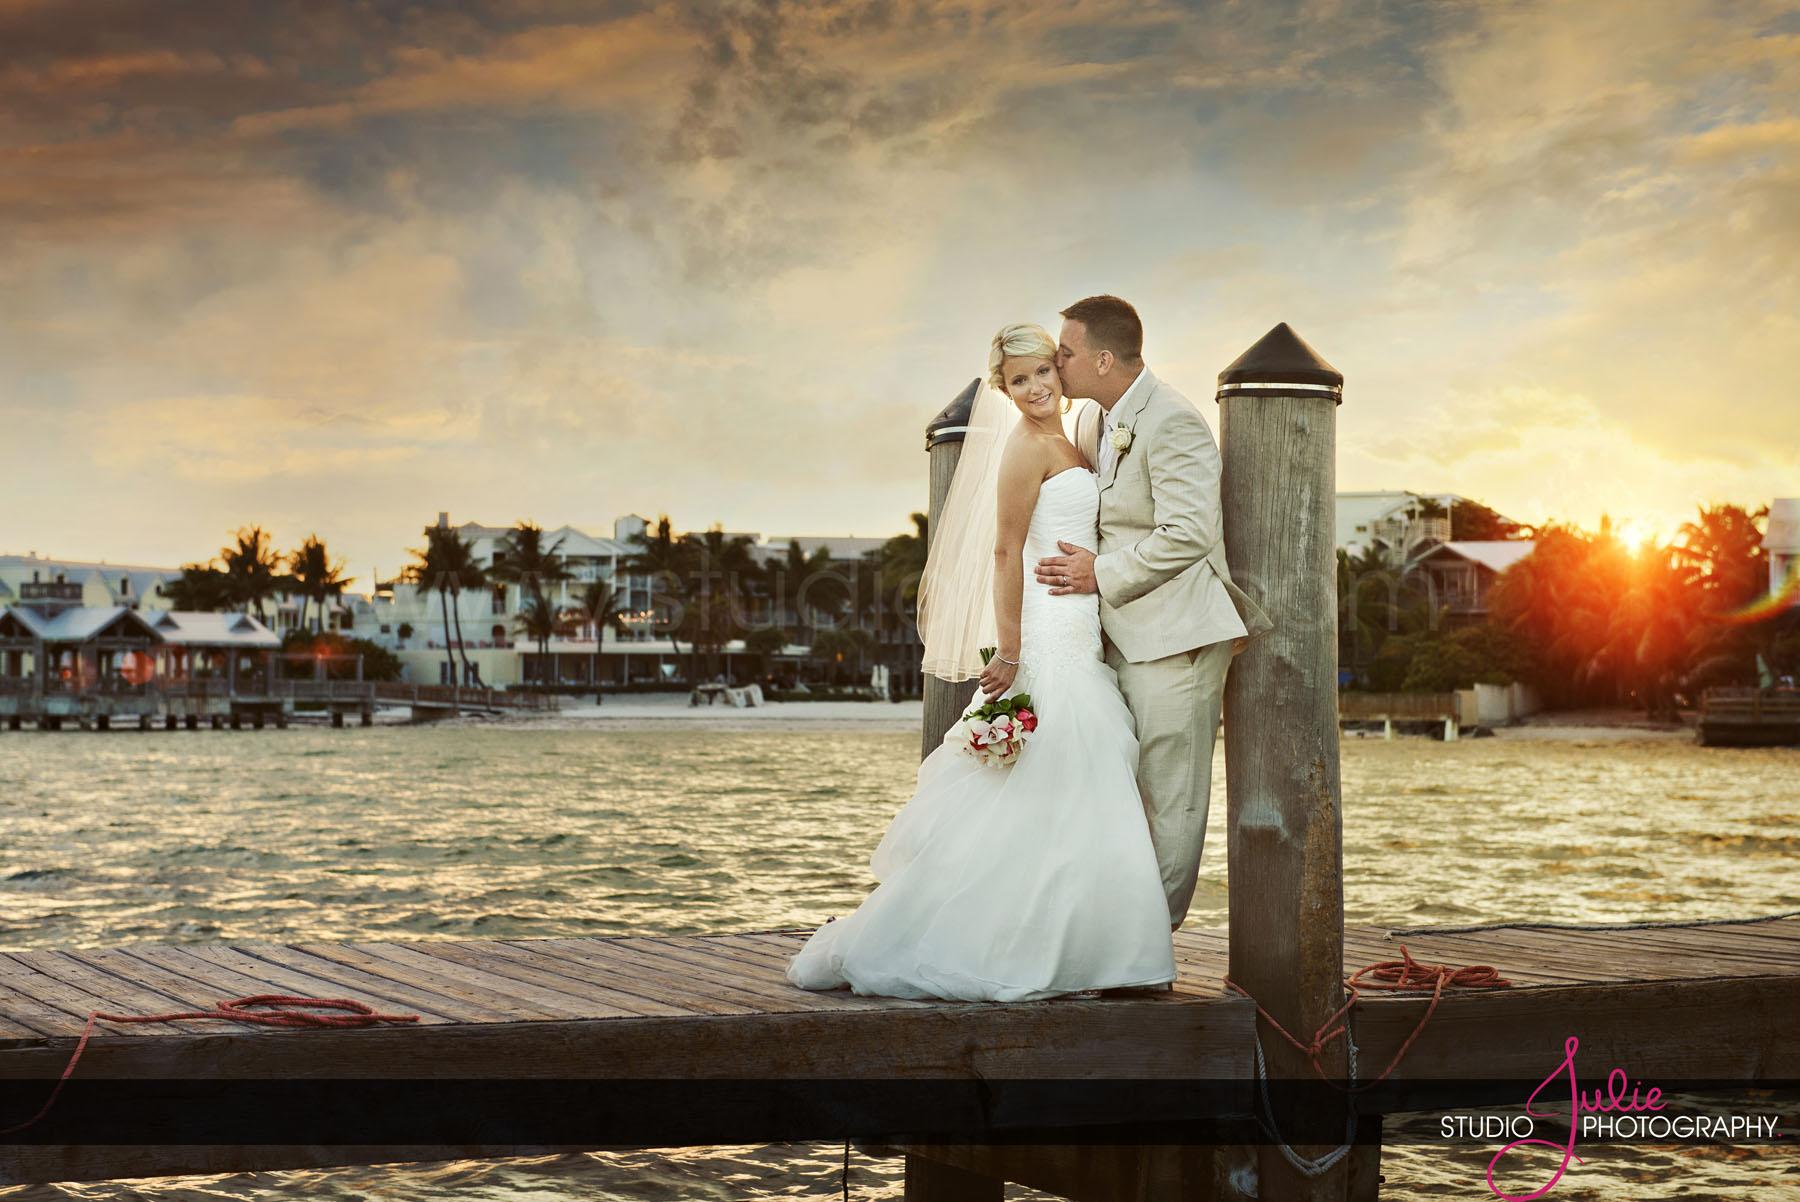 STEPHANIE + IAN   CASA MARINA RESORT WEDDINGS